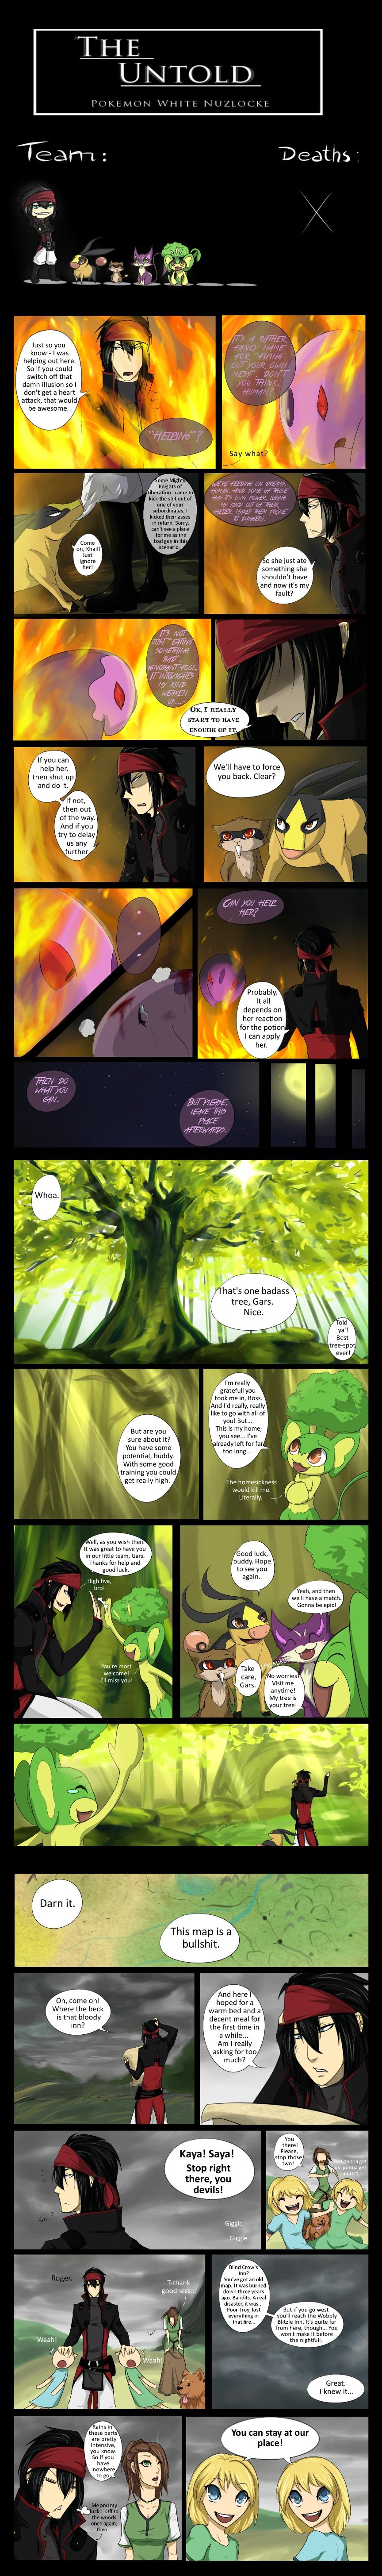 The Untold - part 10 by Antarija